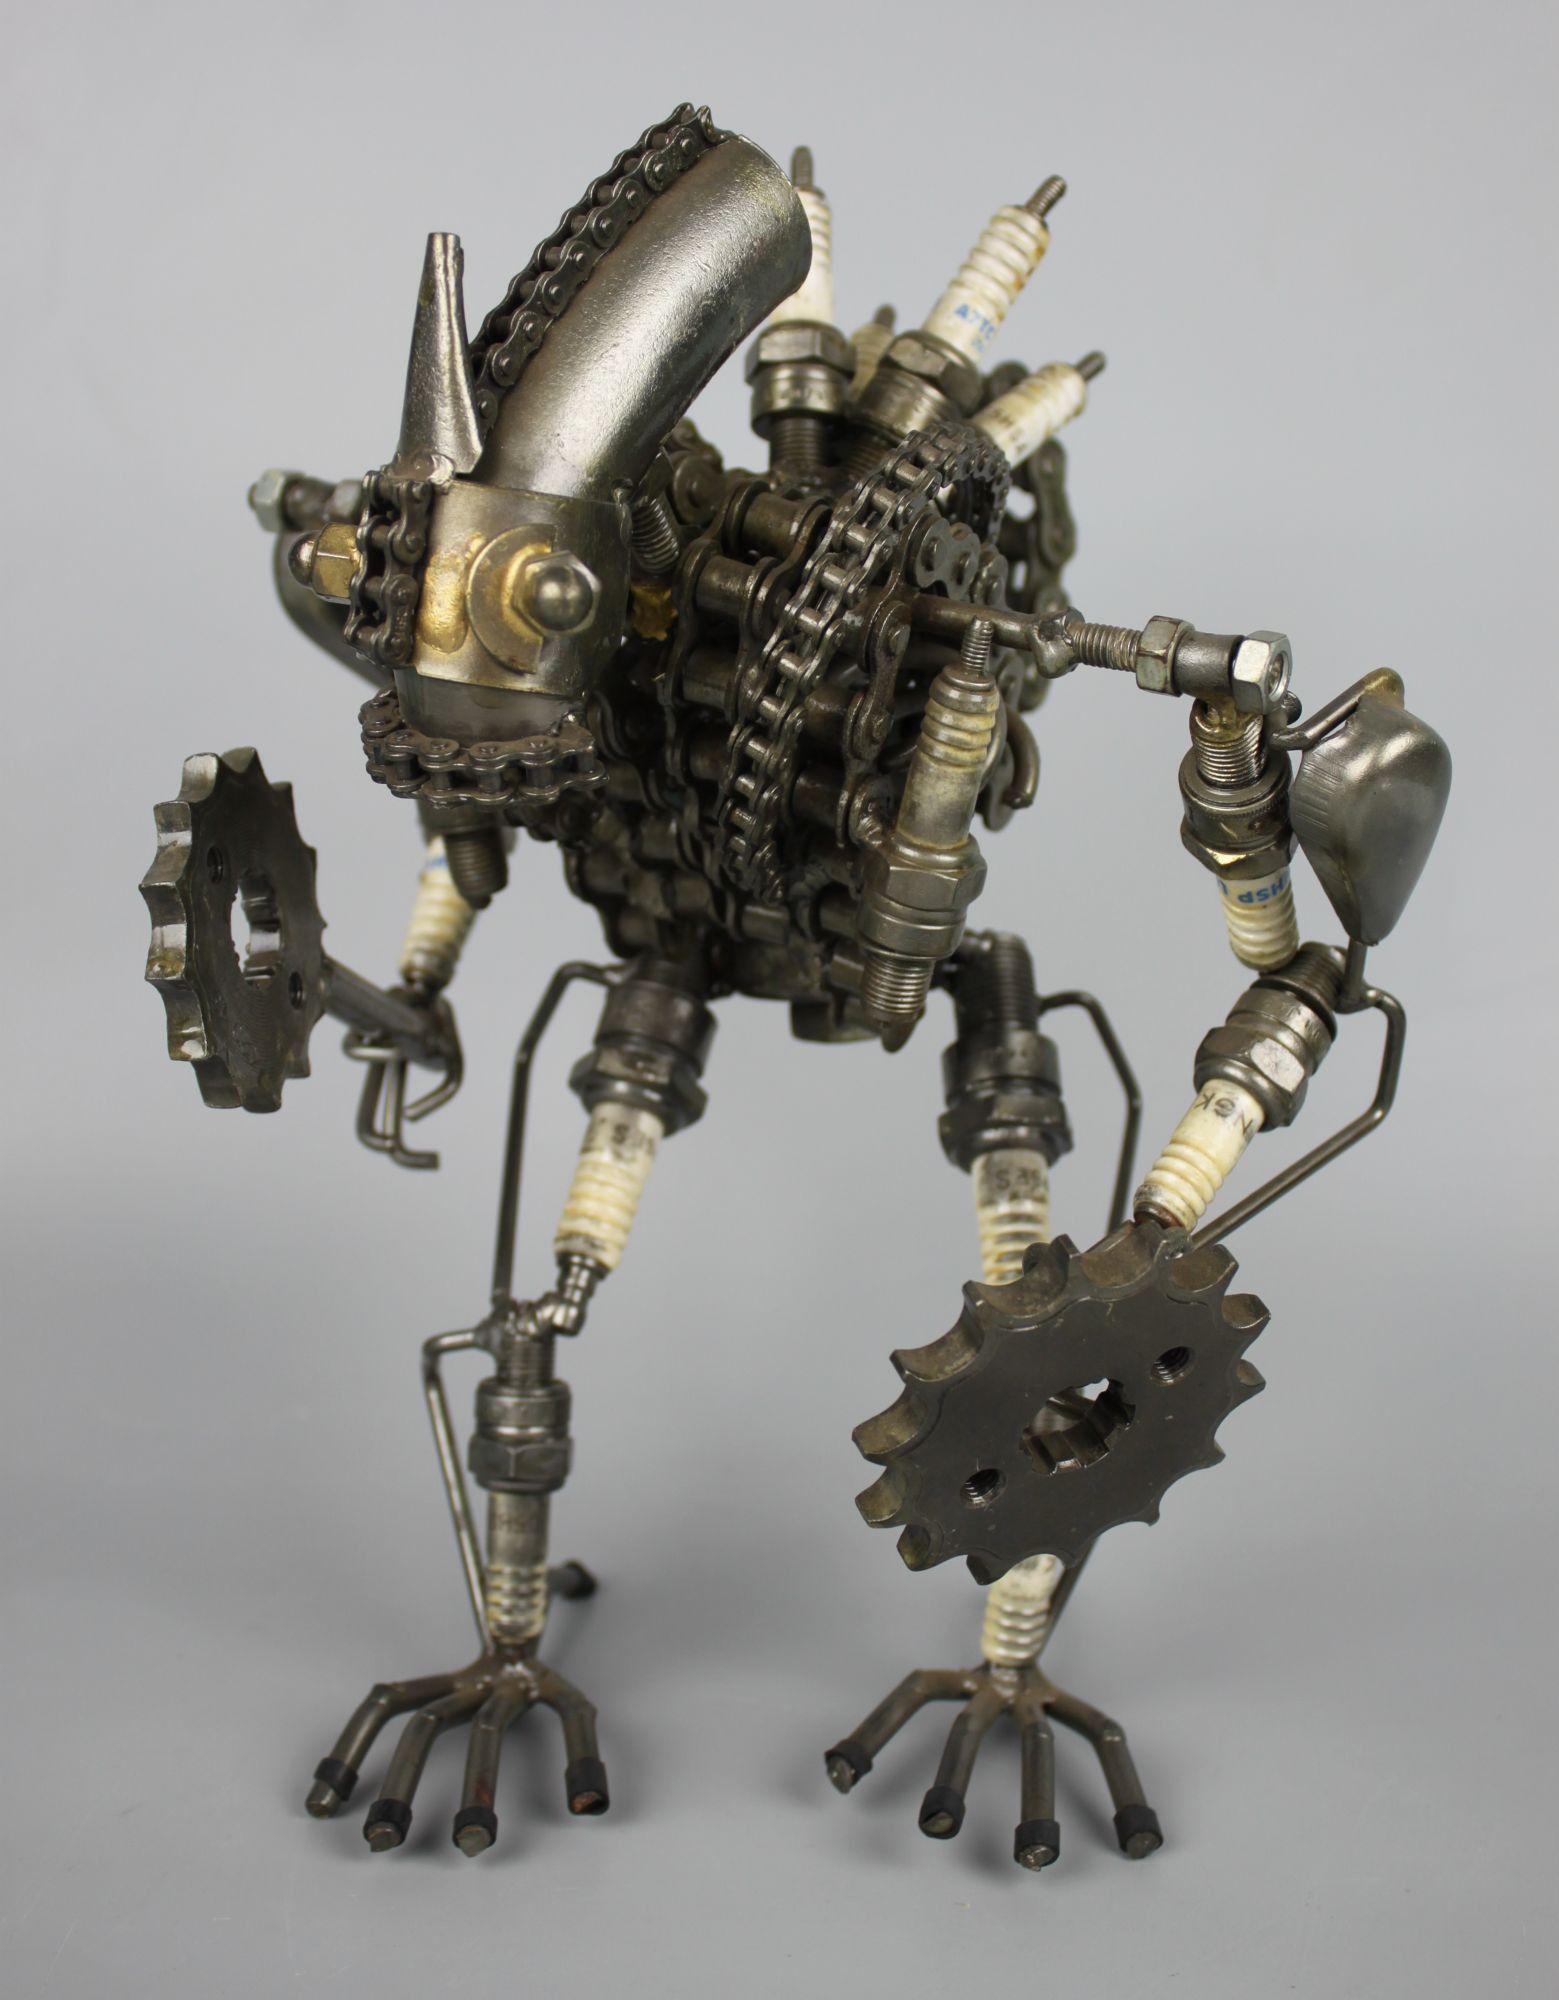 Scrap metal sculpture model recycled handmade art robot